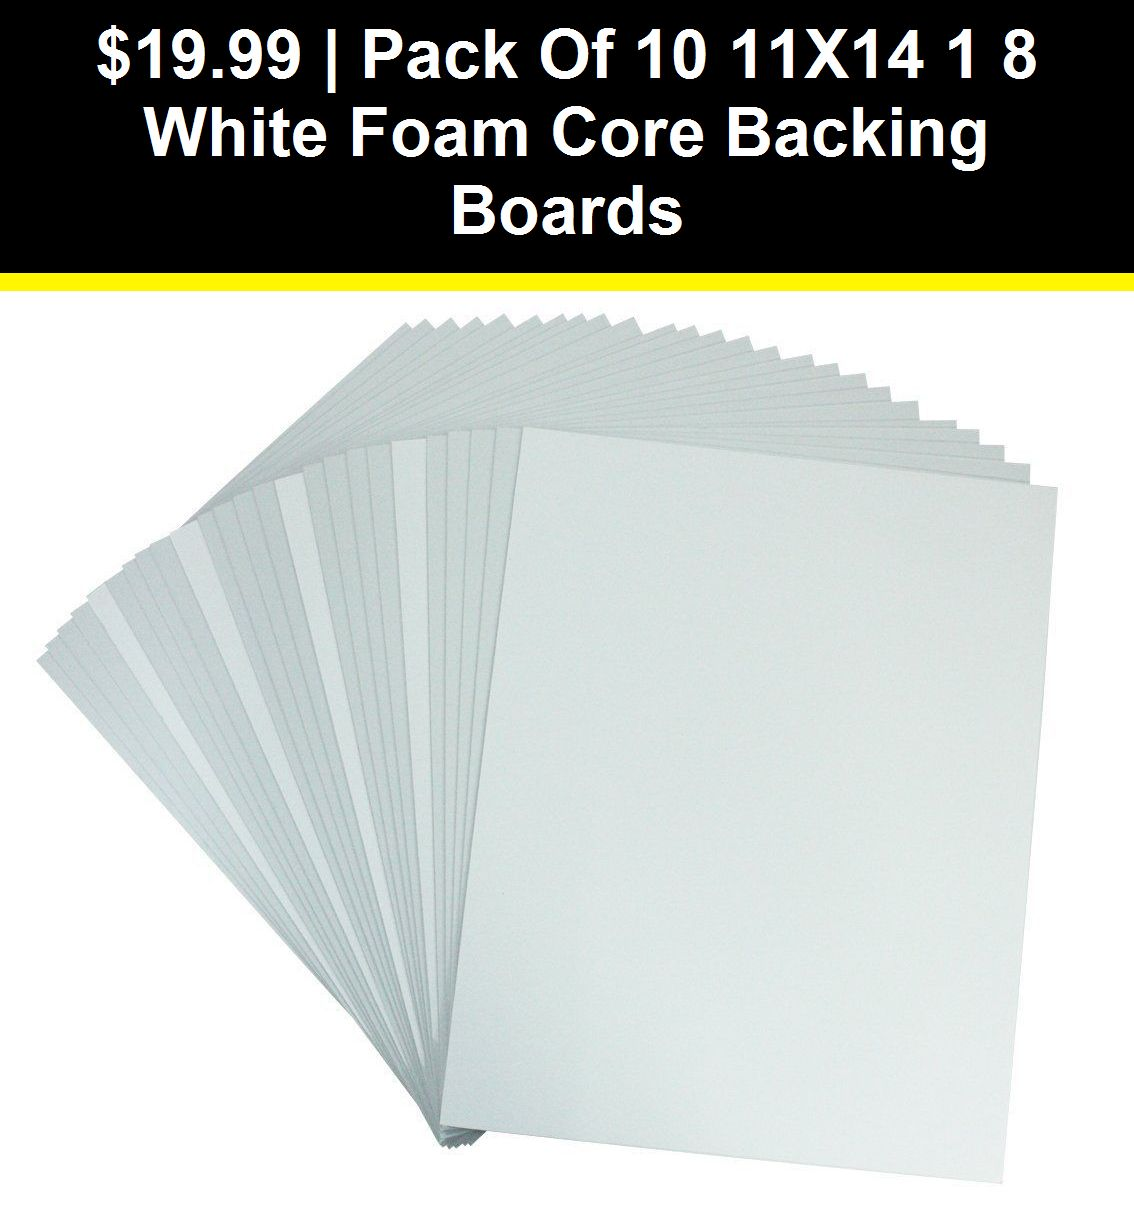 Details About Pack Of 10 11x14 1 8 White Foam Core Backing Boards Foam Core Foam Antique Picture Frames